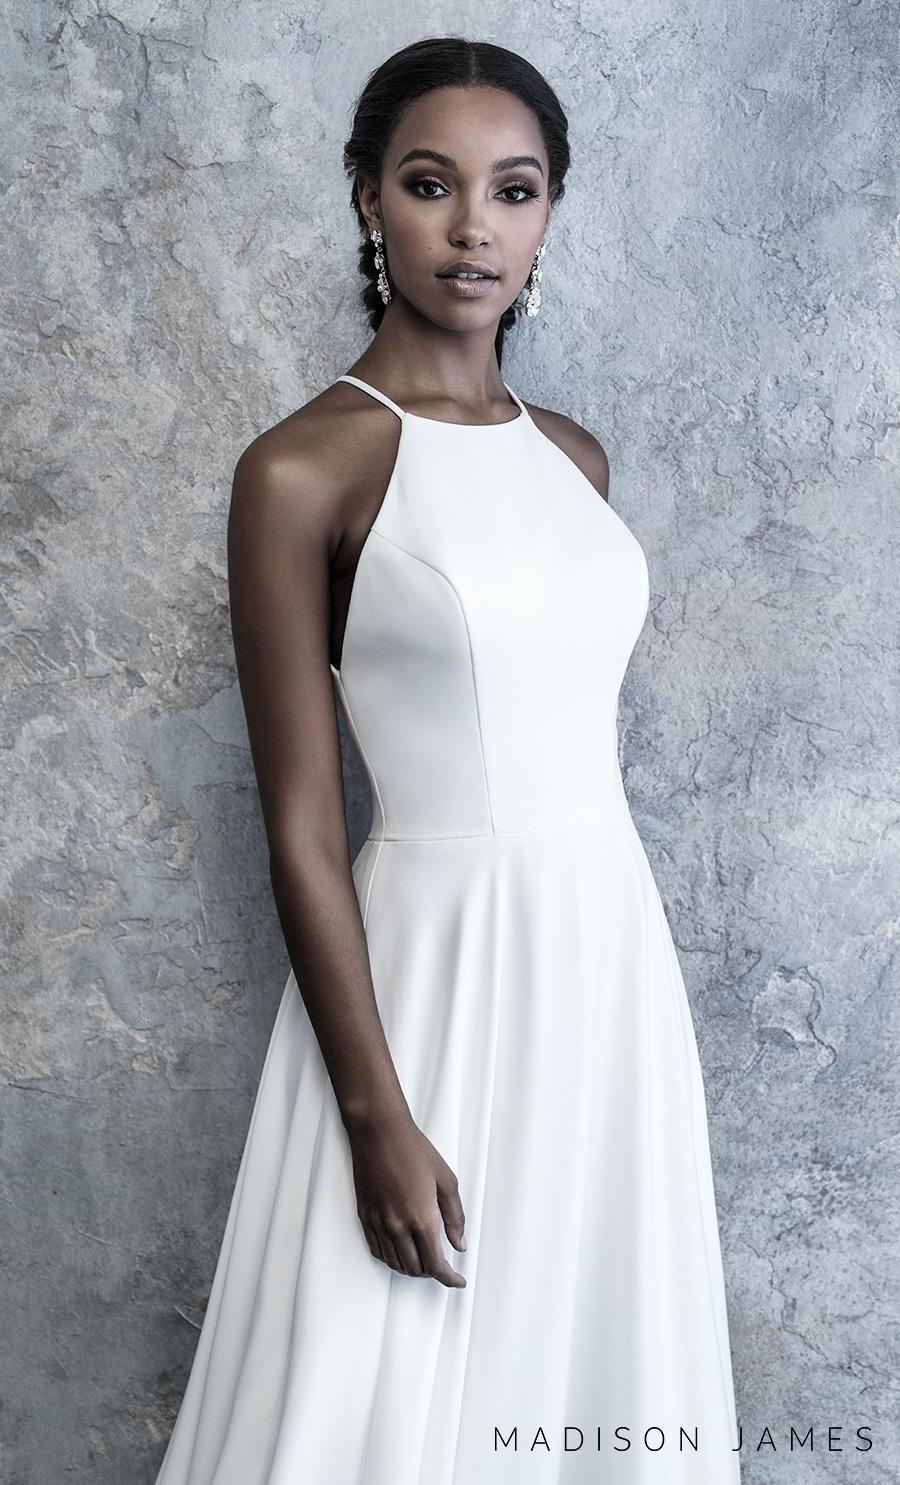 madison james 2019 bridal sleeveless halter neck simple minimalist elegant classy a line wedding dress keyhole back chapel train (518) zv